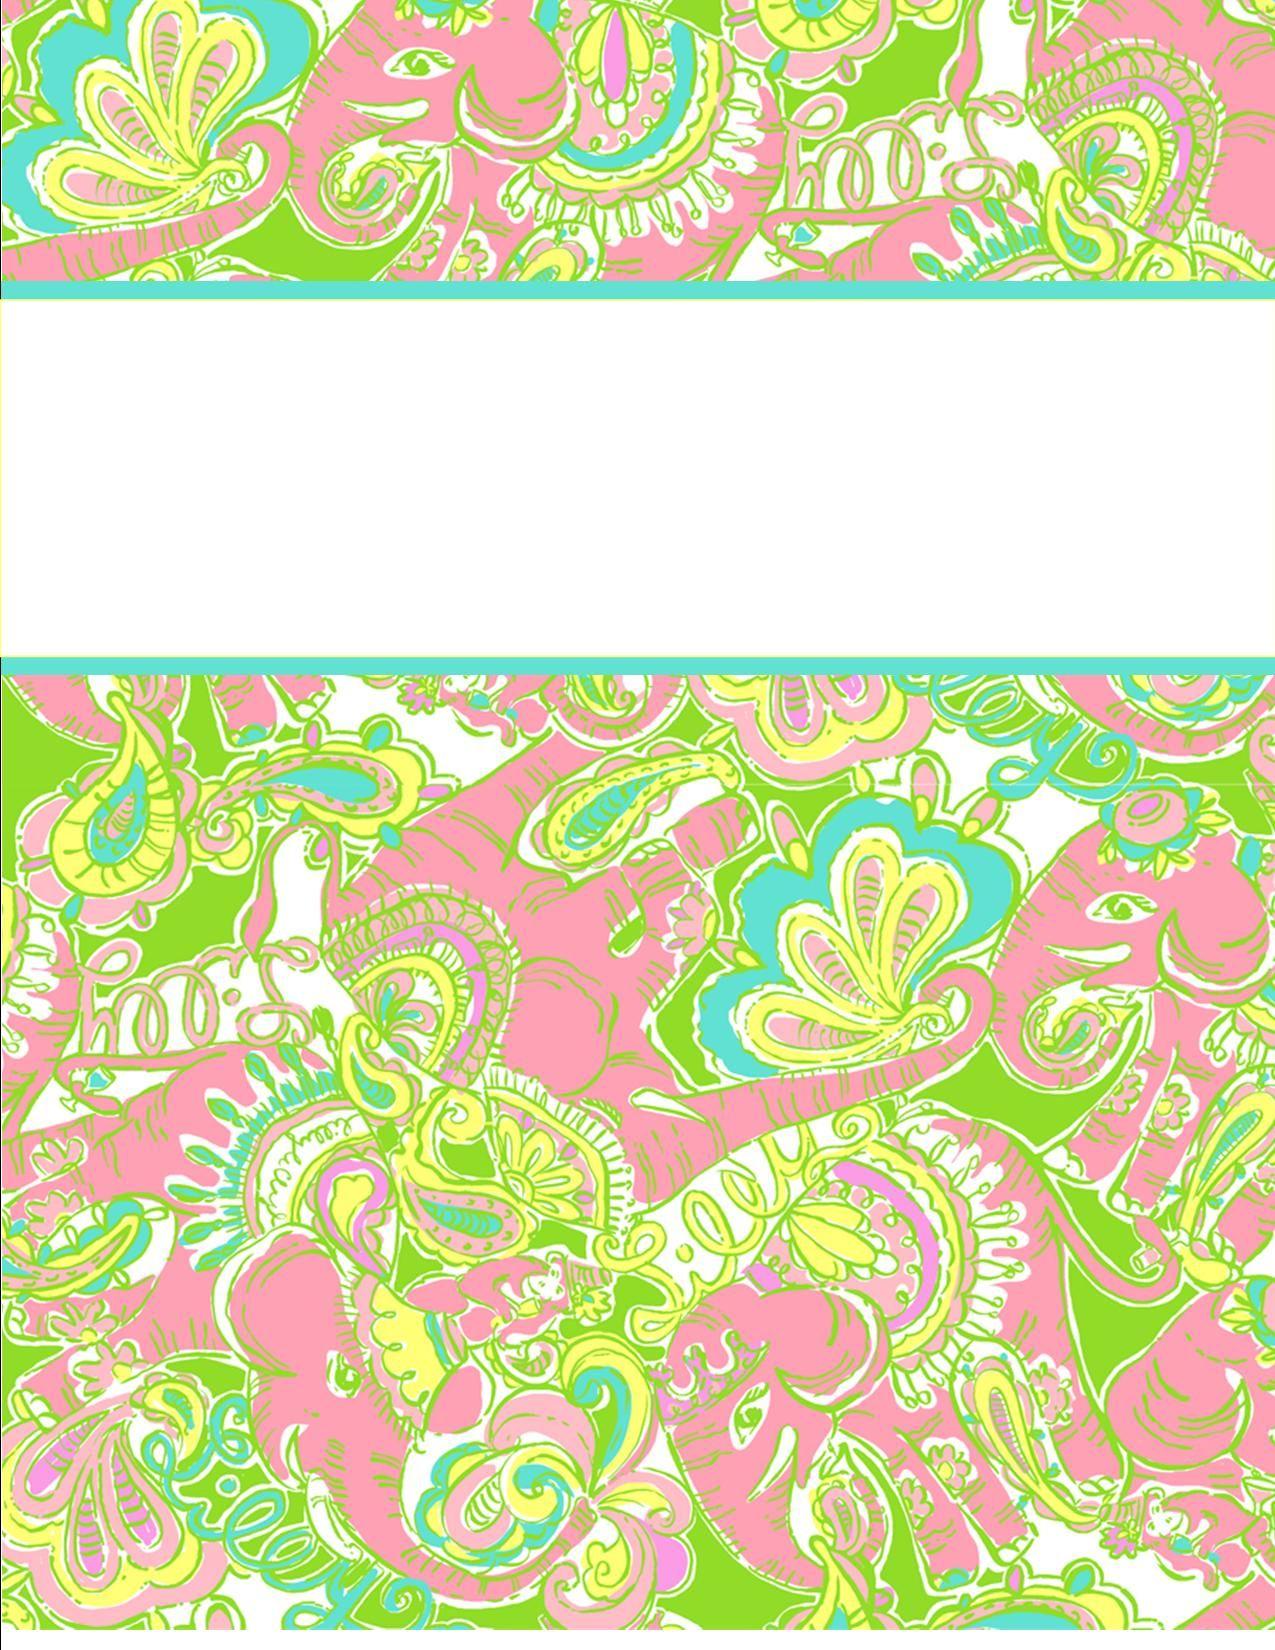 binder covers free